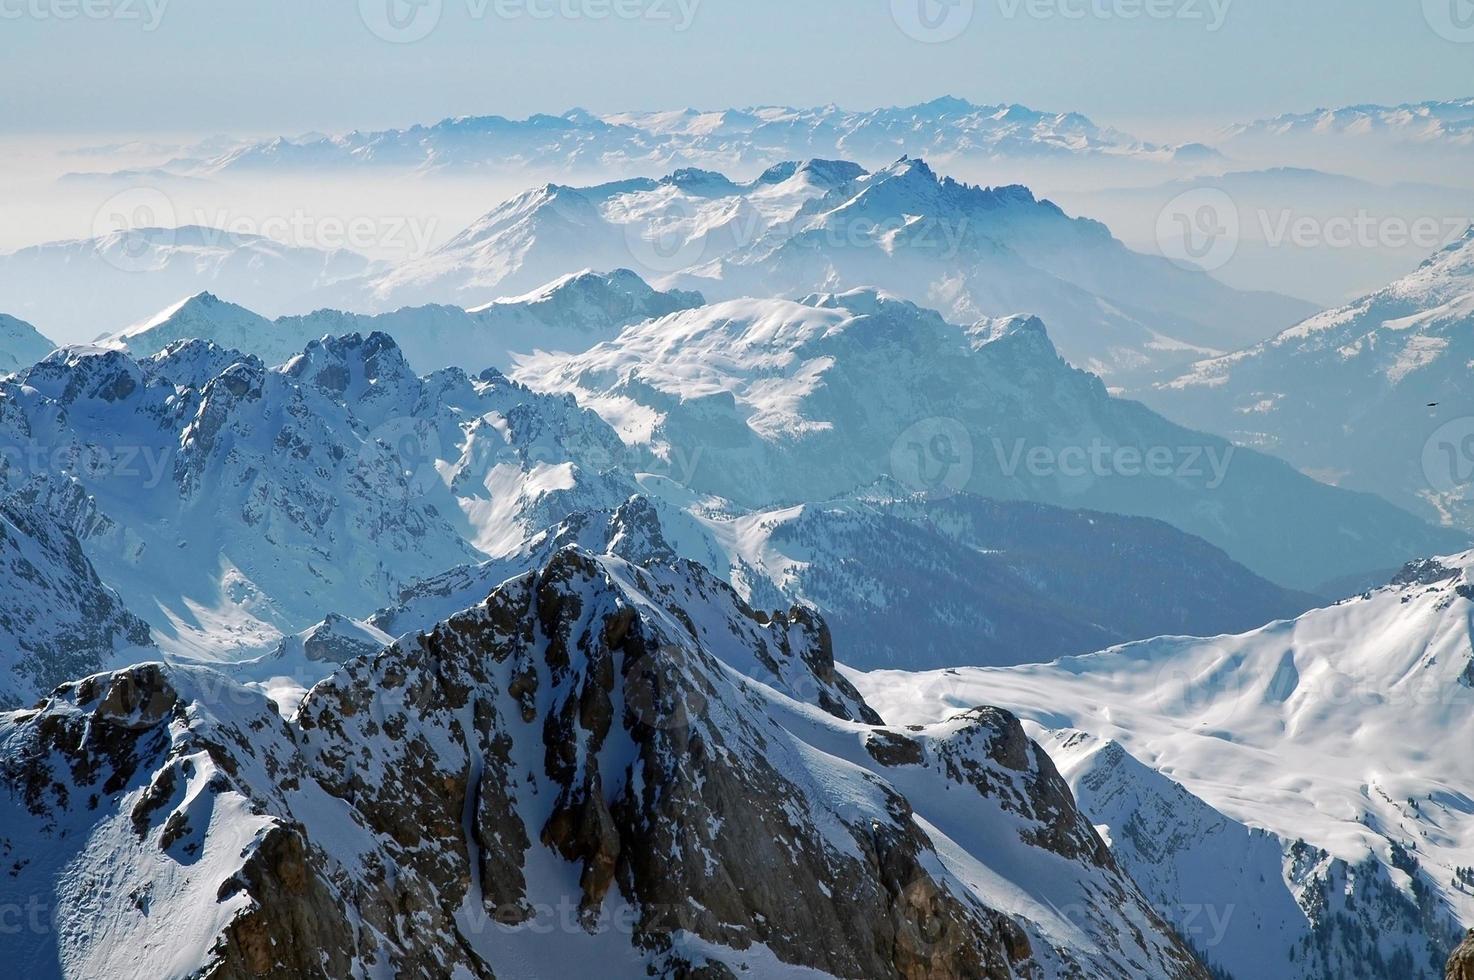 montanhas cobertas de neve nas dolomitas italianas foto